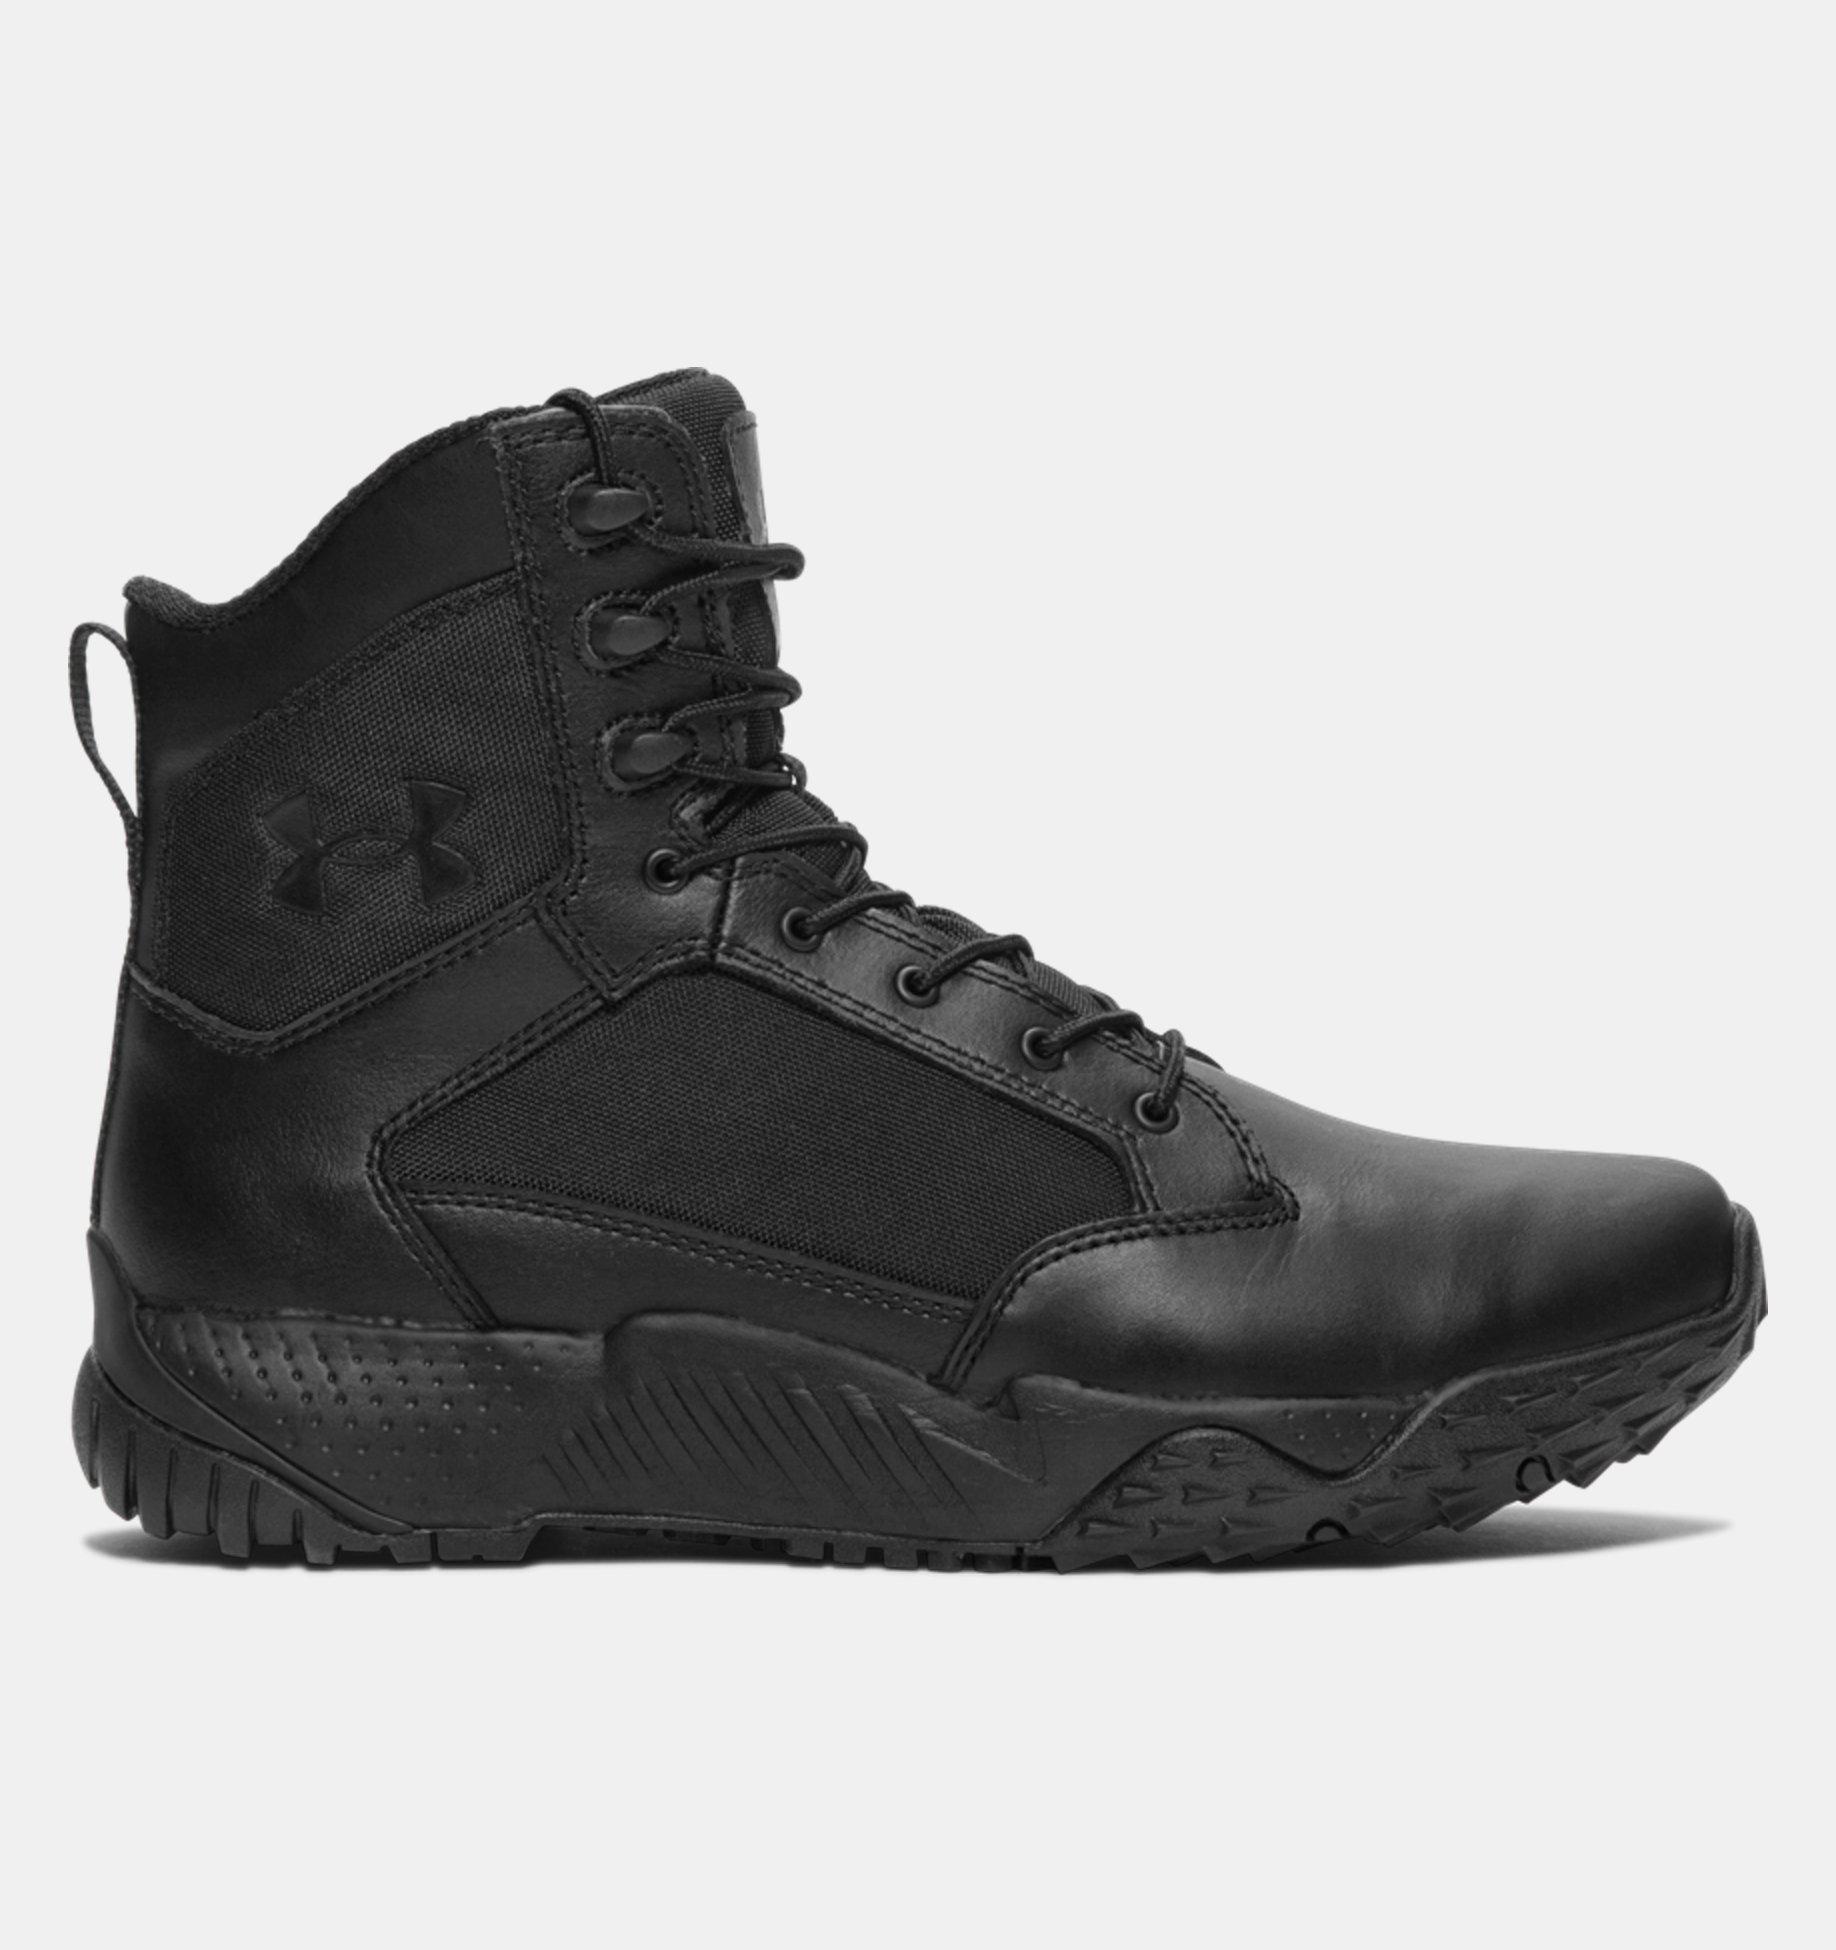 Apariencia Están deprimidos Bandido  Men's UA Stellar Tactical Boots   Under Armour